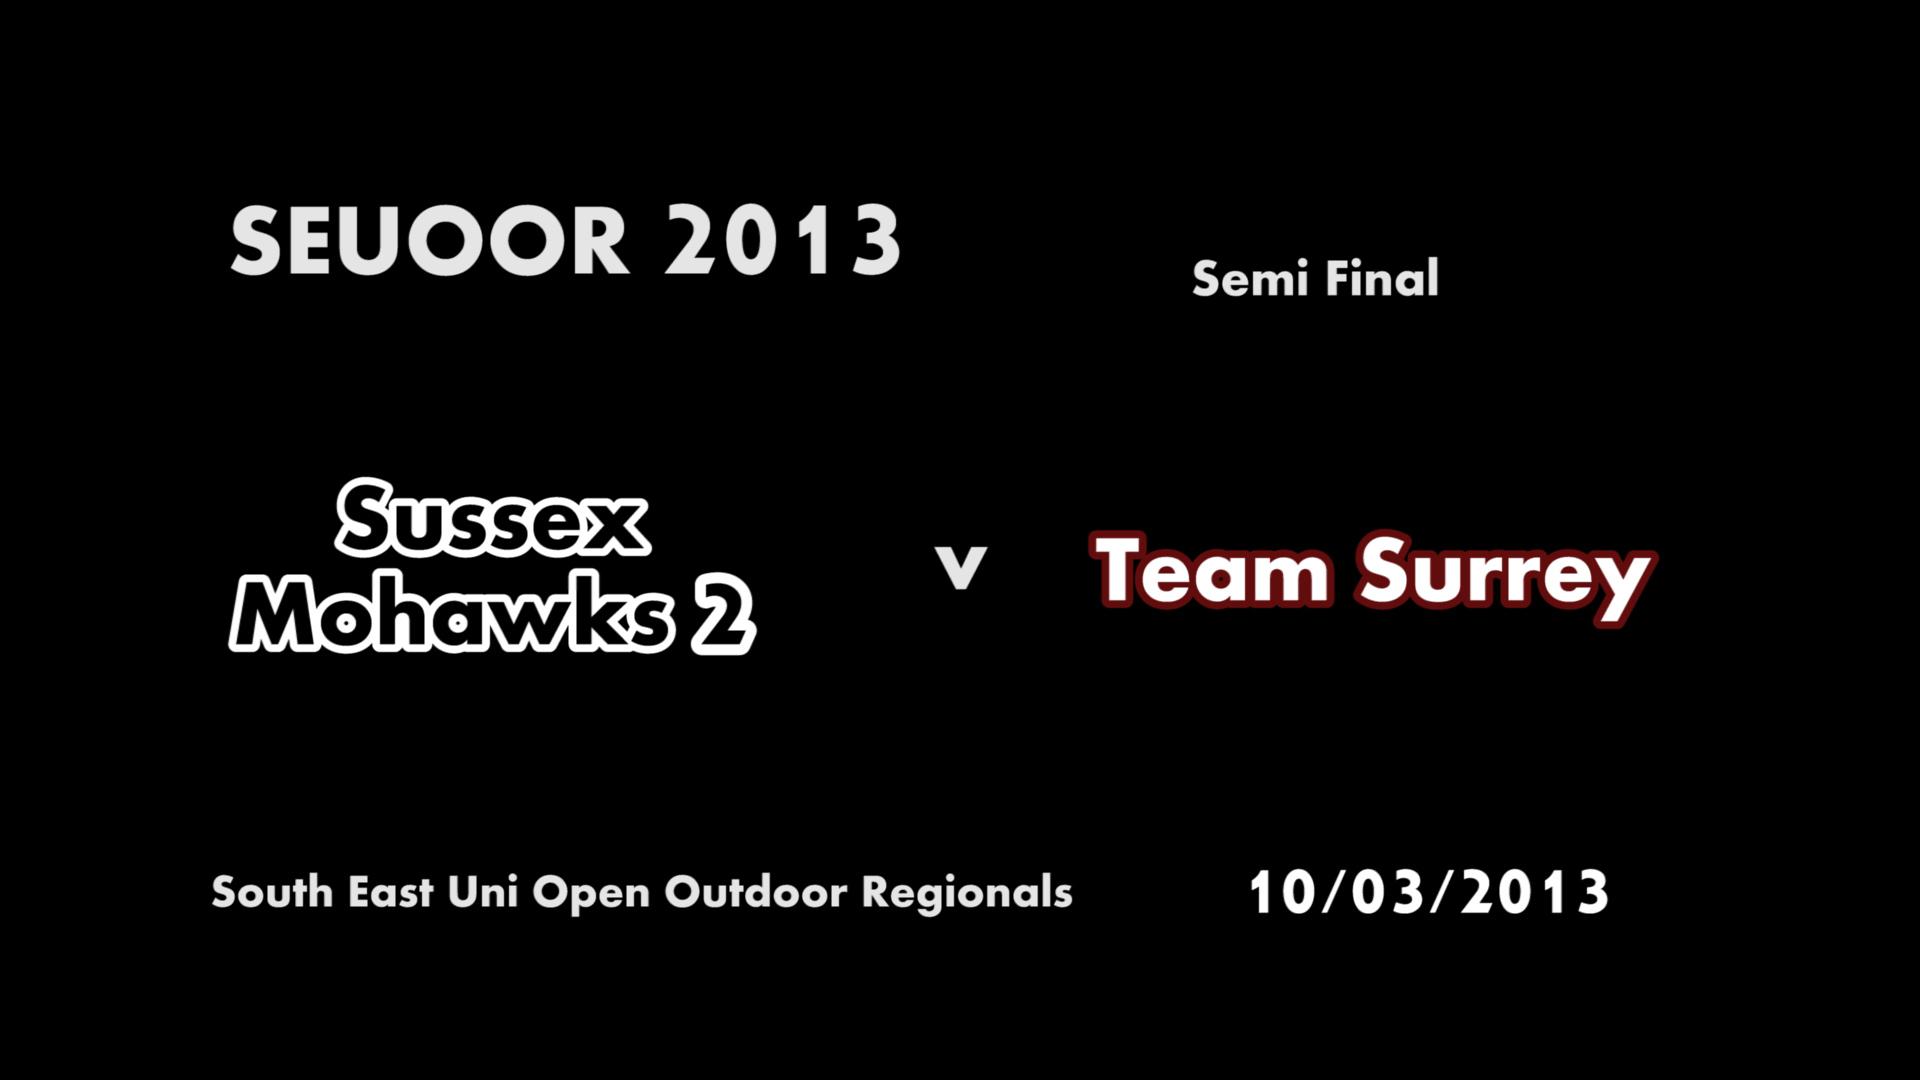 SEUOOR 2013: Mohawks 2 v Team Surrey